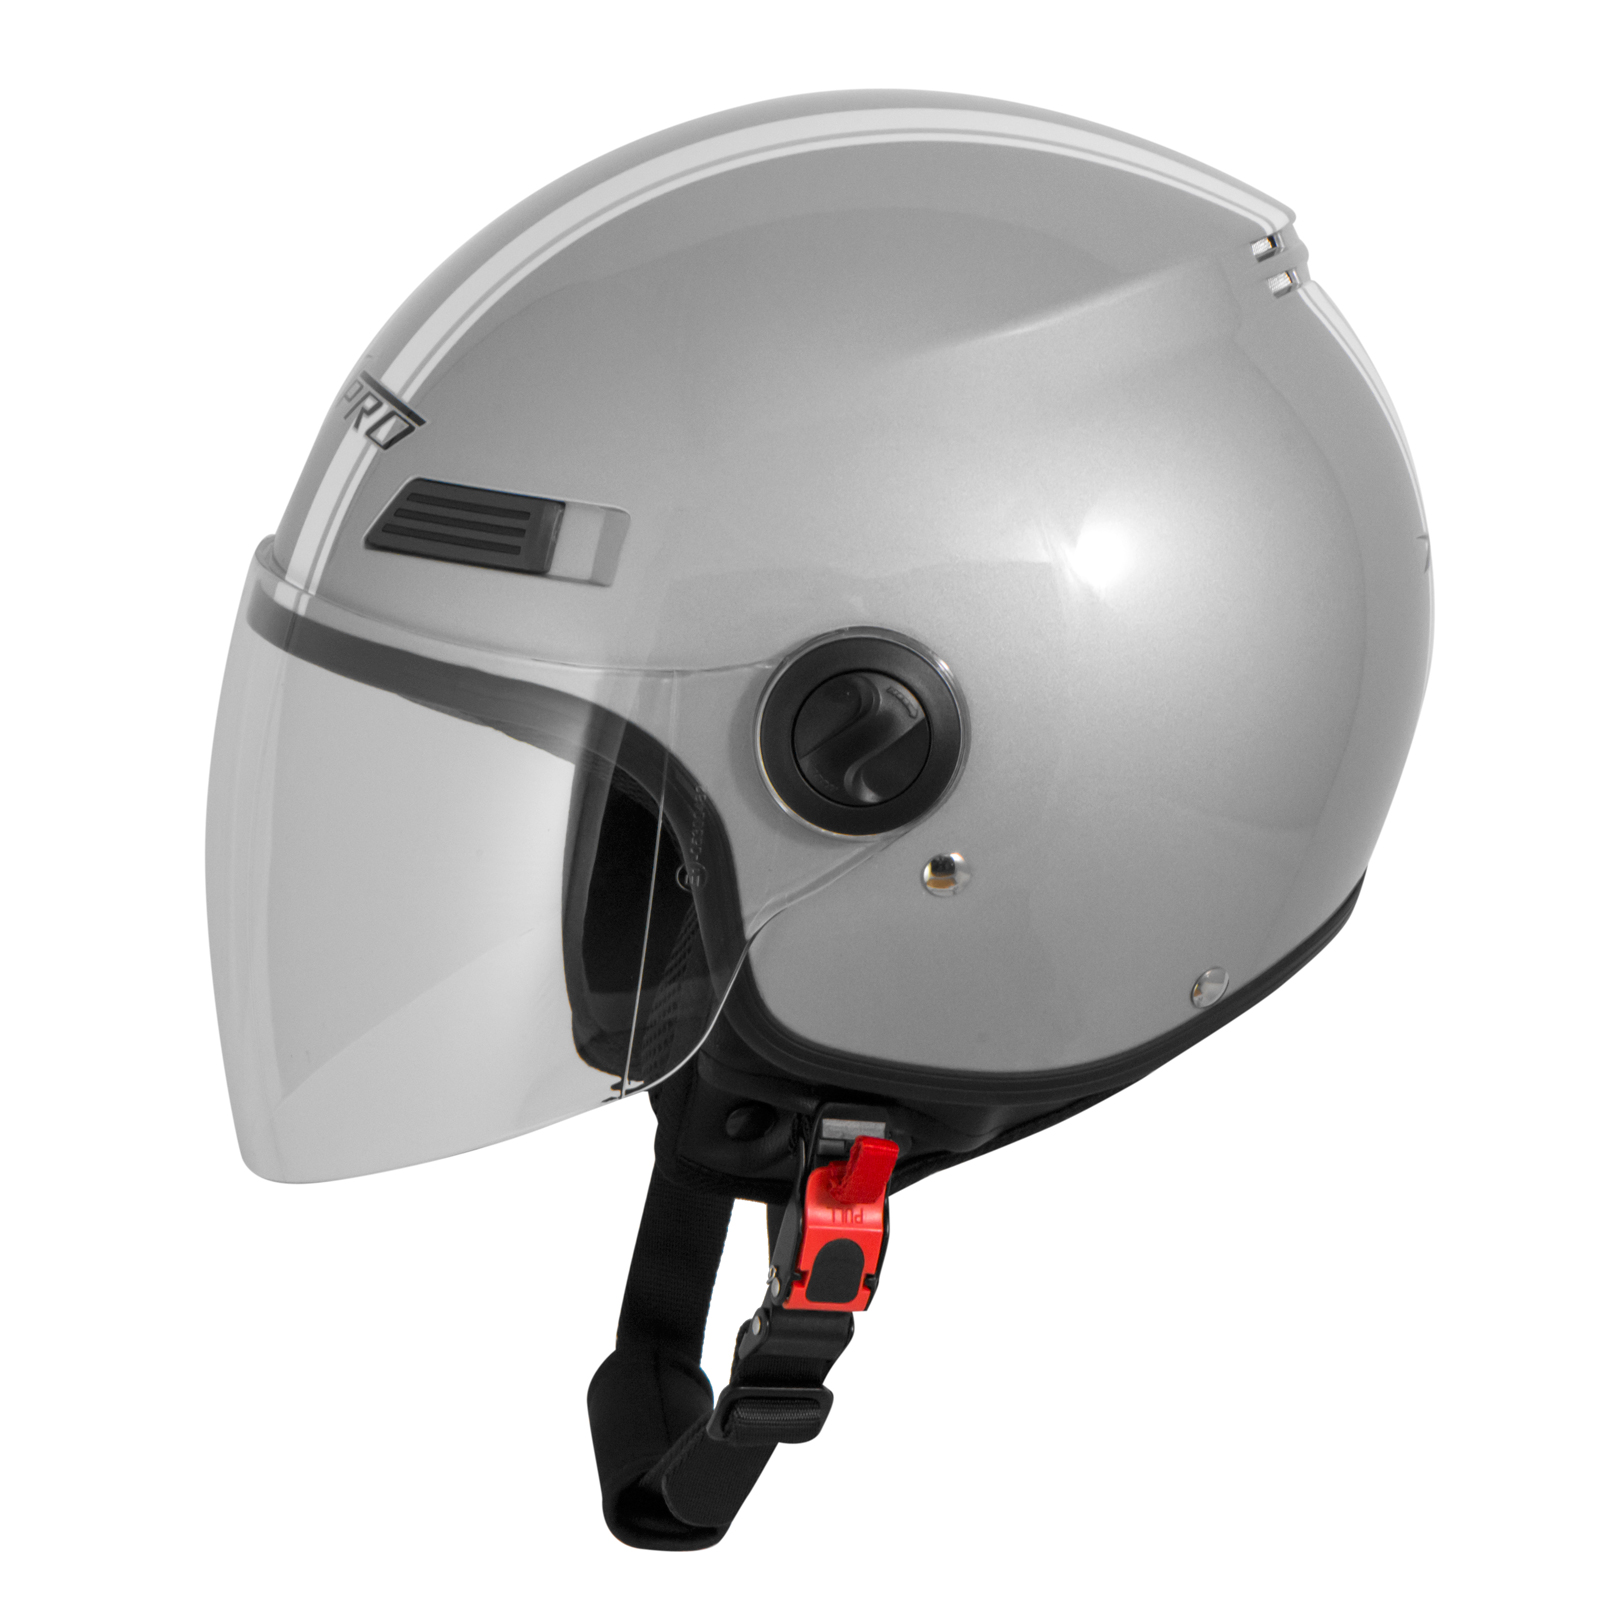 casque avec moto scooter quad jet visiere ece 22 argent sonicmoto ebay. Black Bedroom Furniture Sets. Home Design Ideas